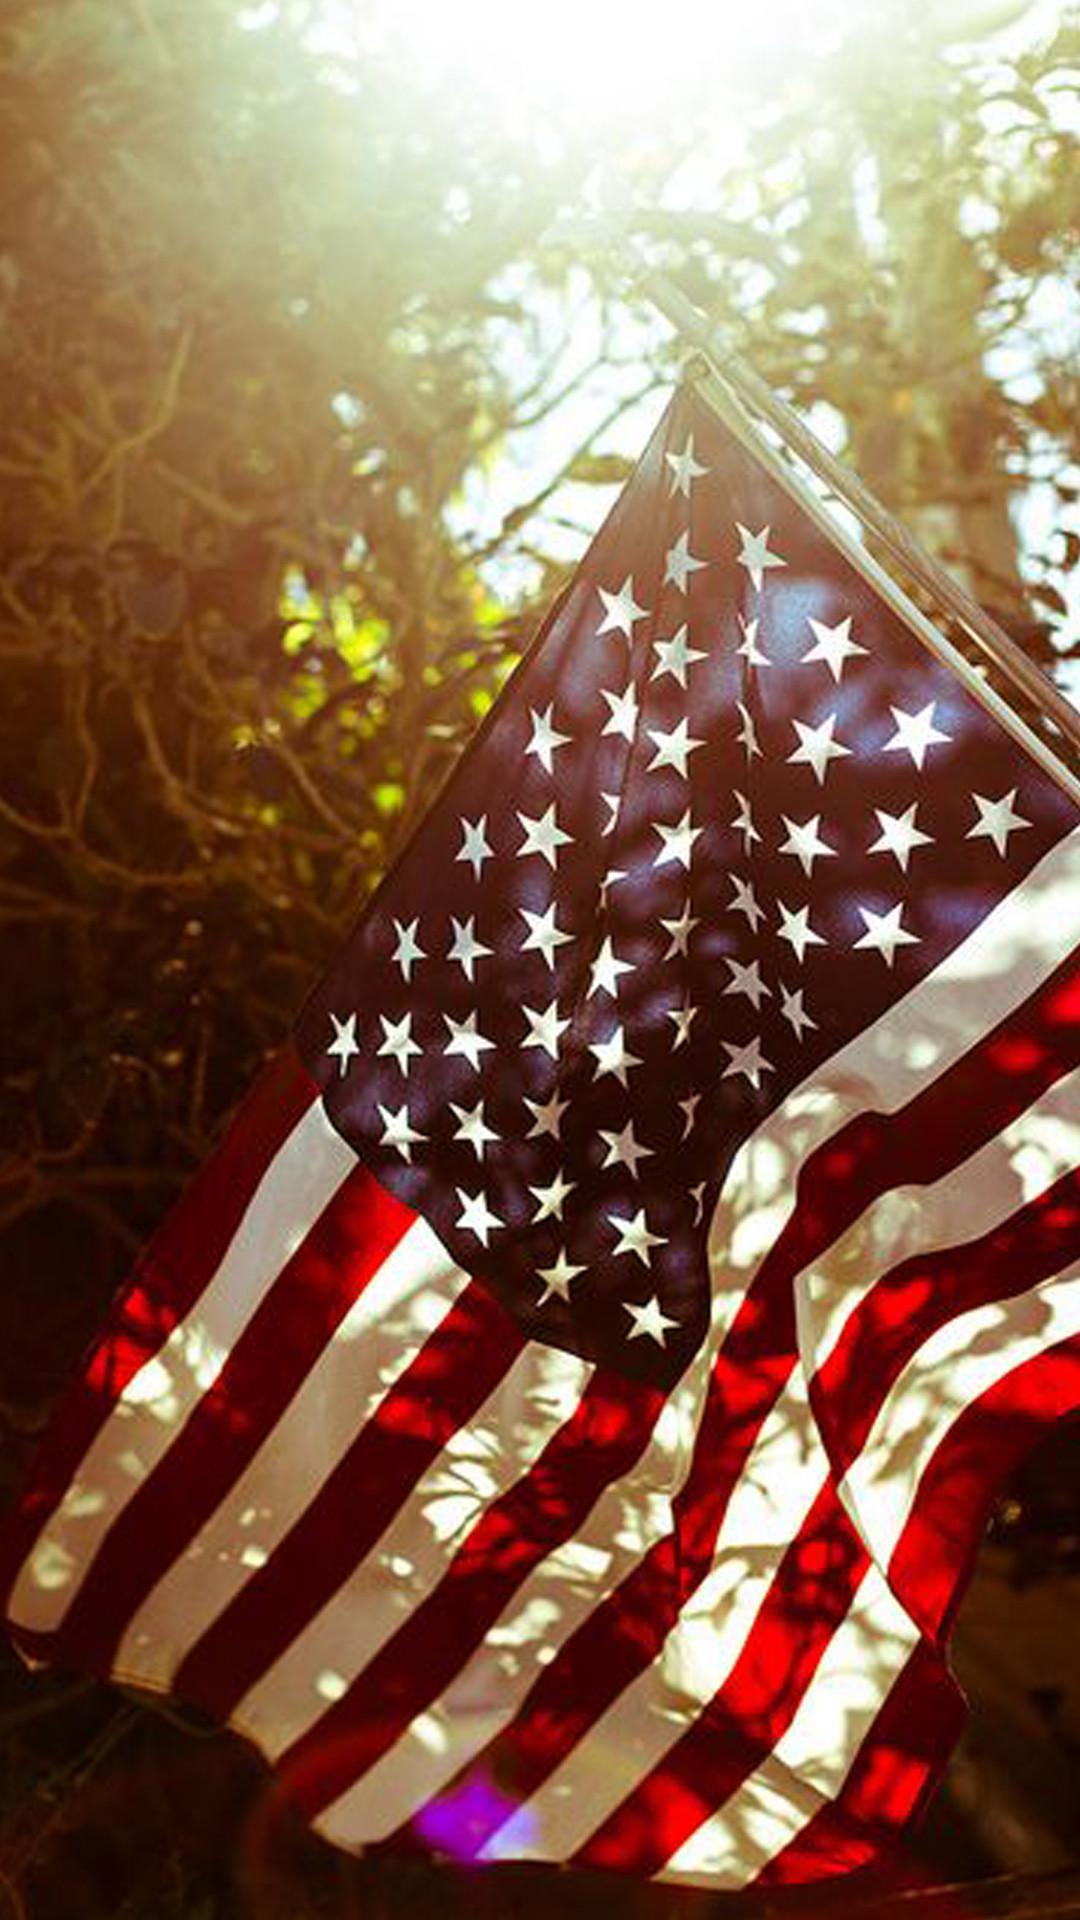 American wallpaper tumblr american flag wallpaper voltagebd Gallery